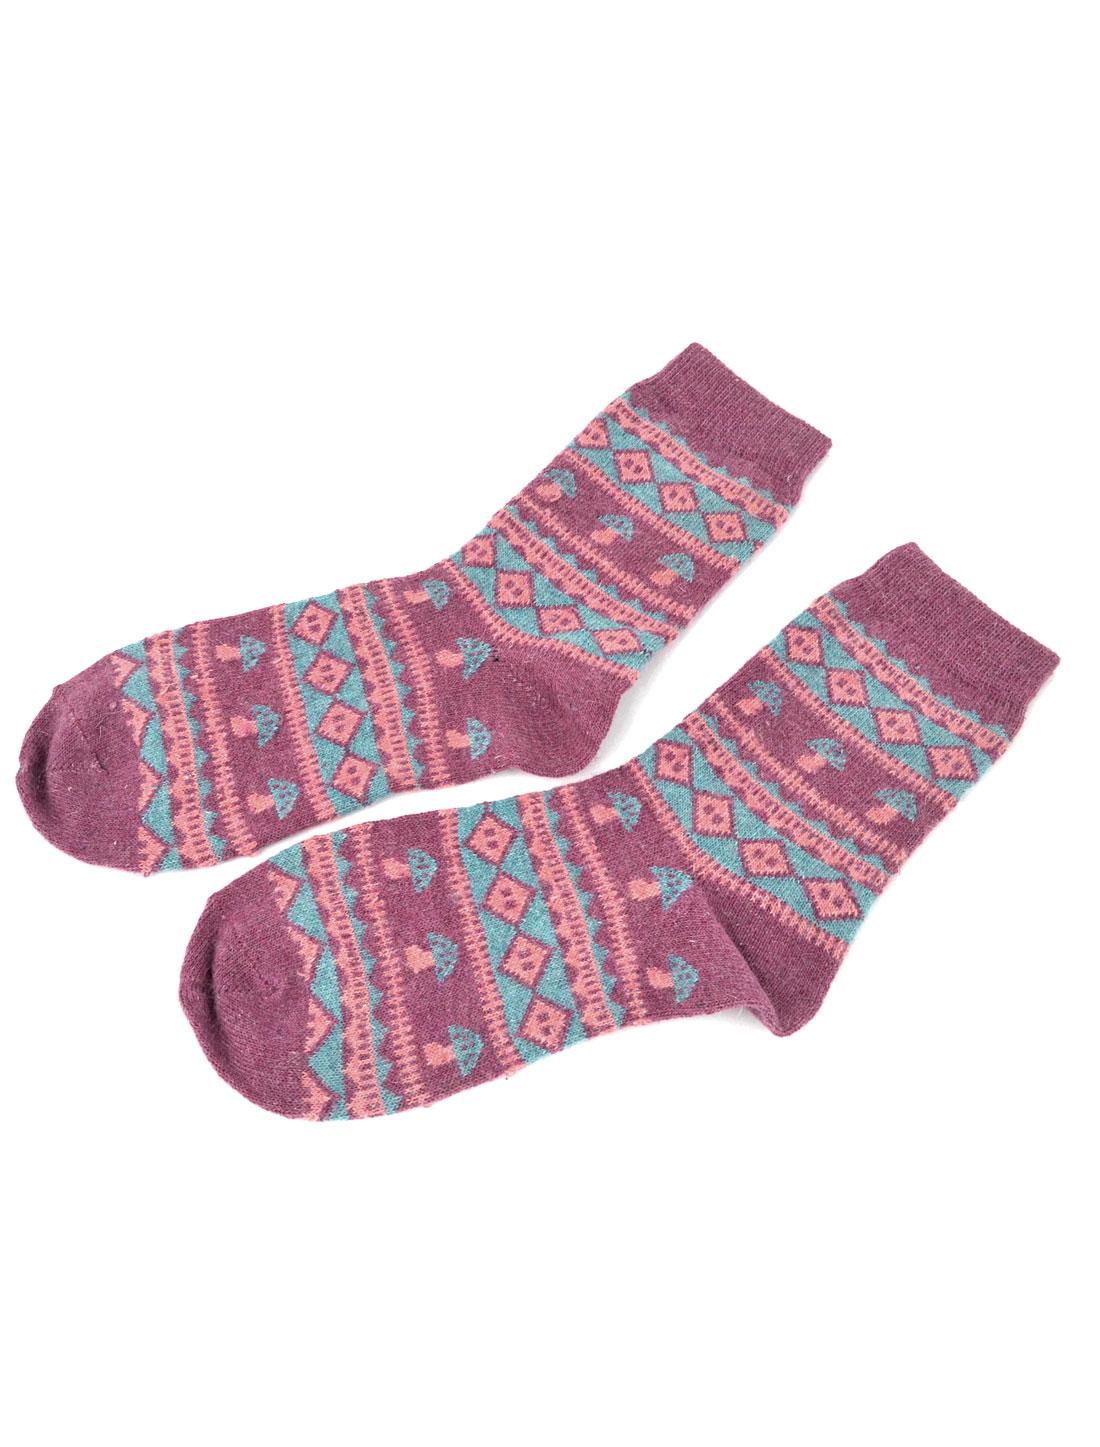 Woman Elastic Cuff Mushroom Pattern Wool Ankle Socks Hosiery Blue Purple Pair